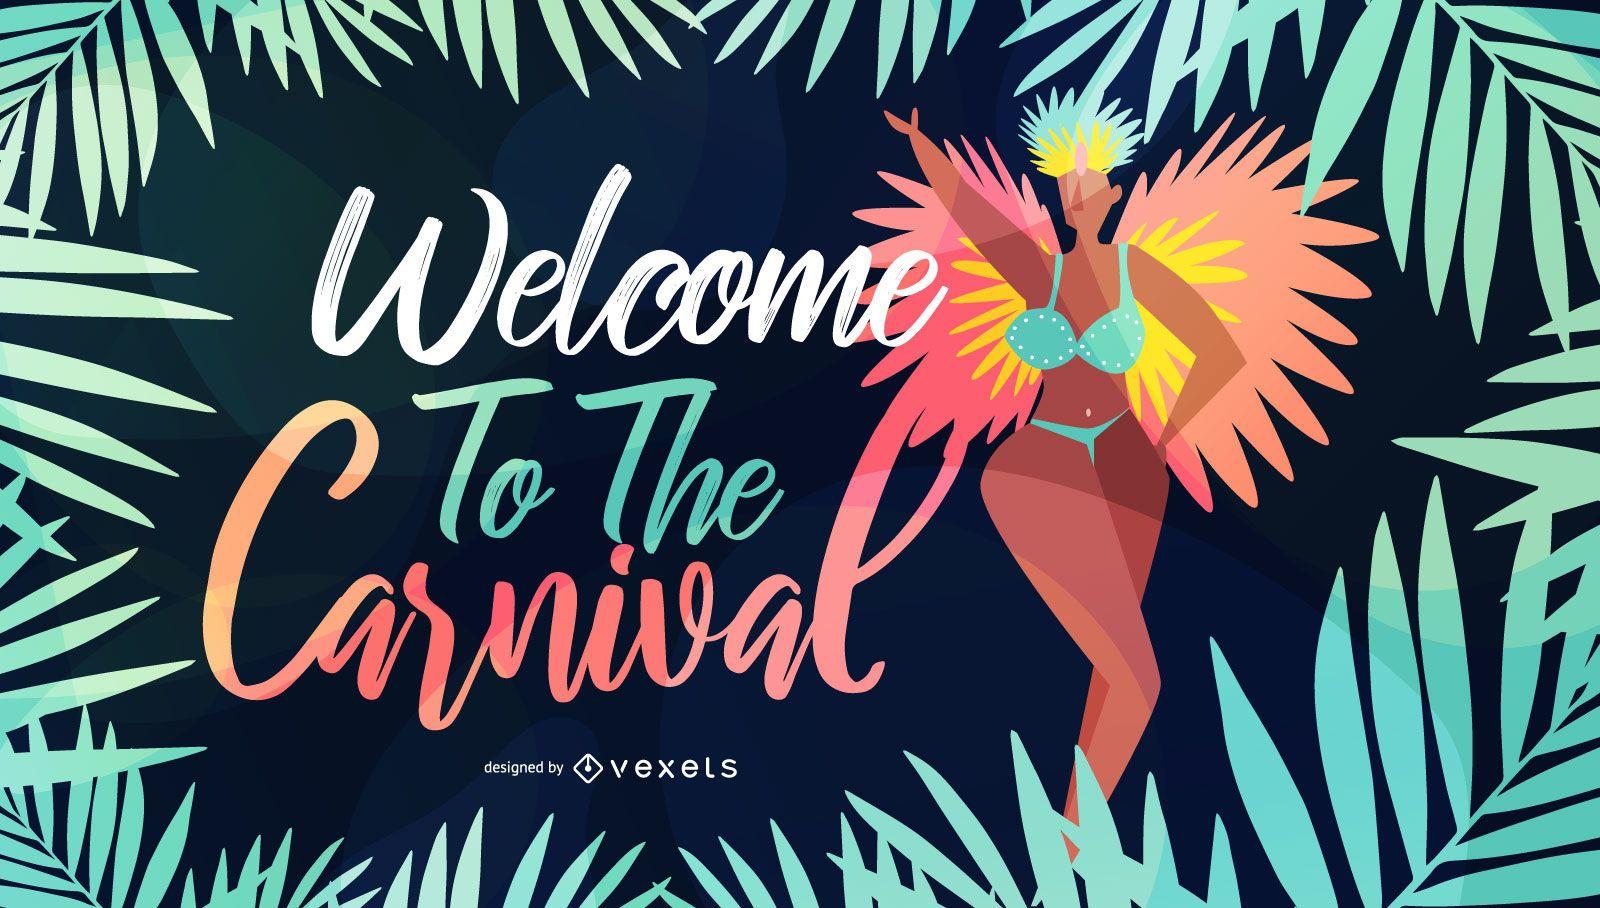 Welcome to Carnival Seasonal Illustration